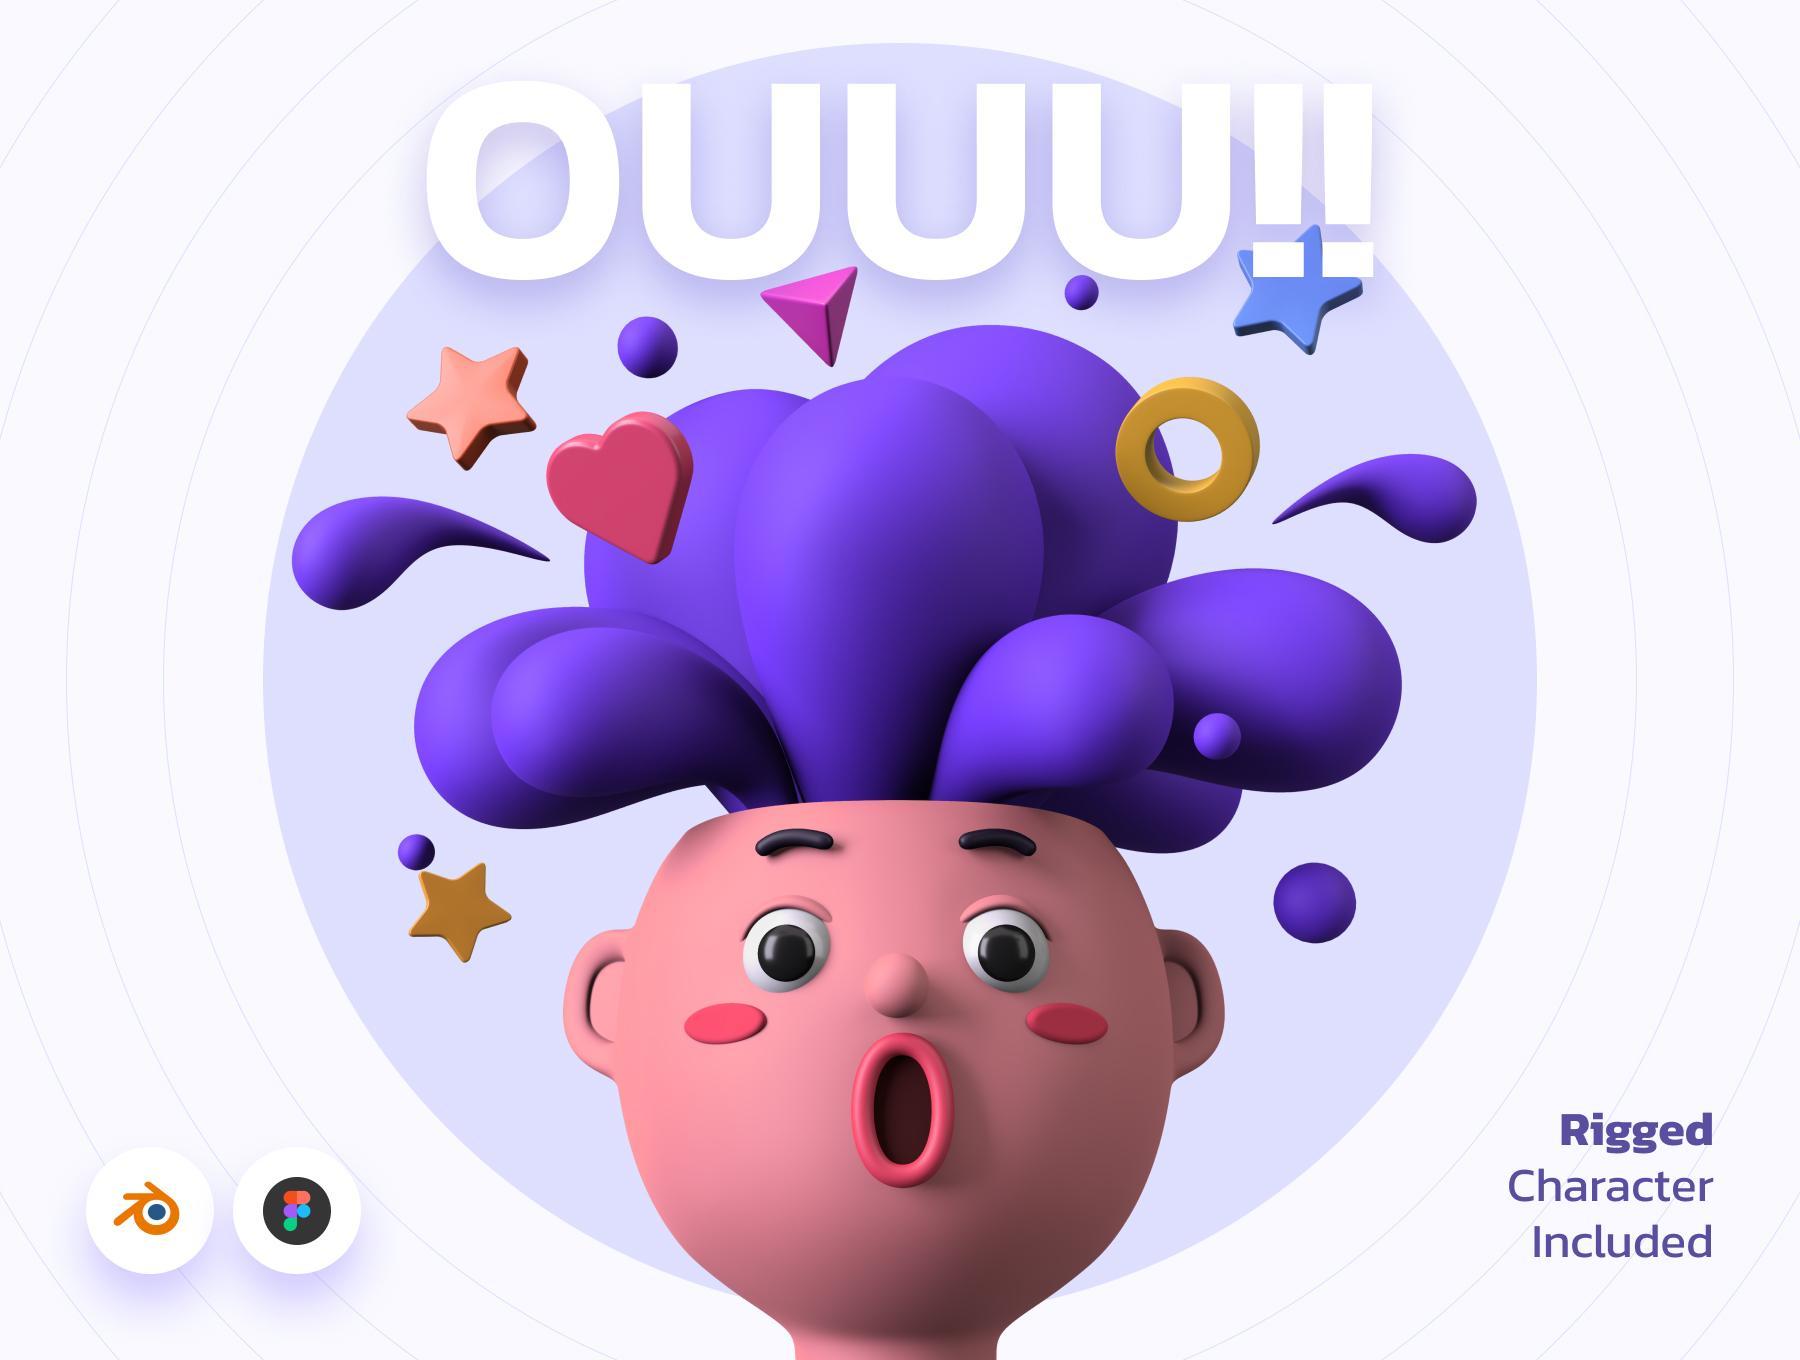 OUUU!!! 3D Illustration